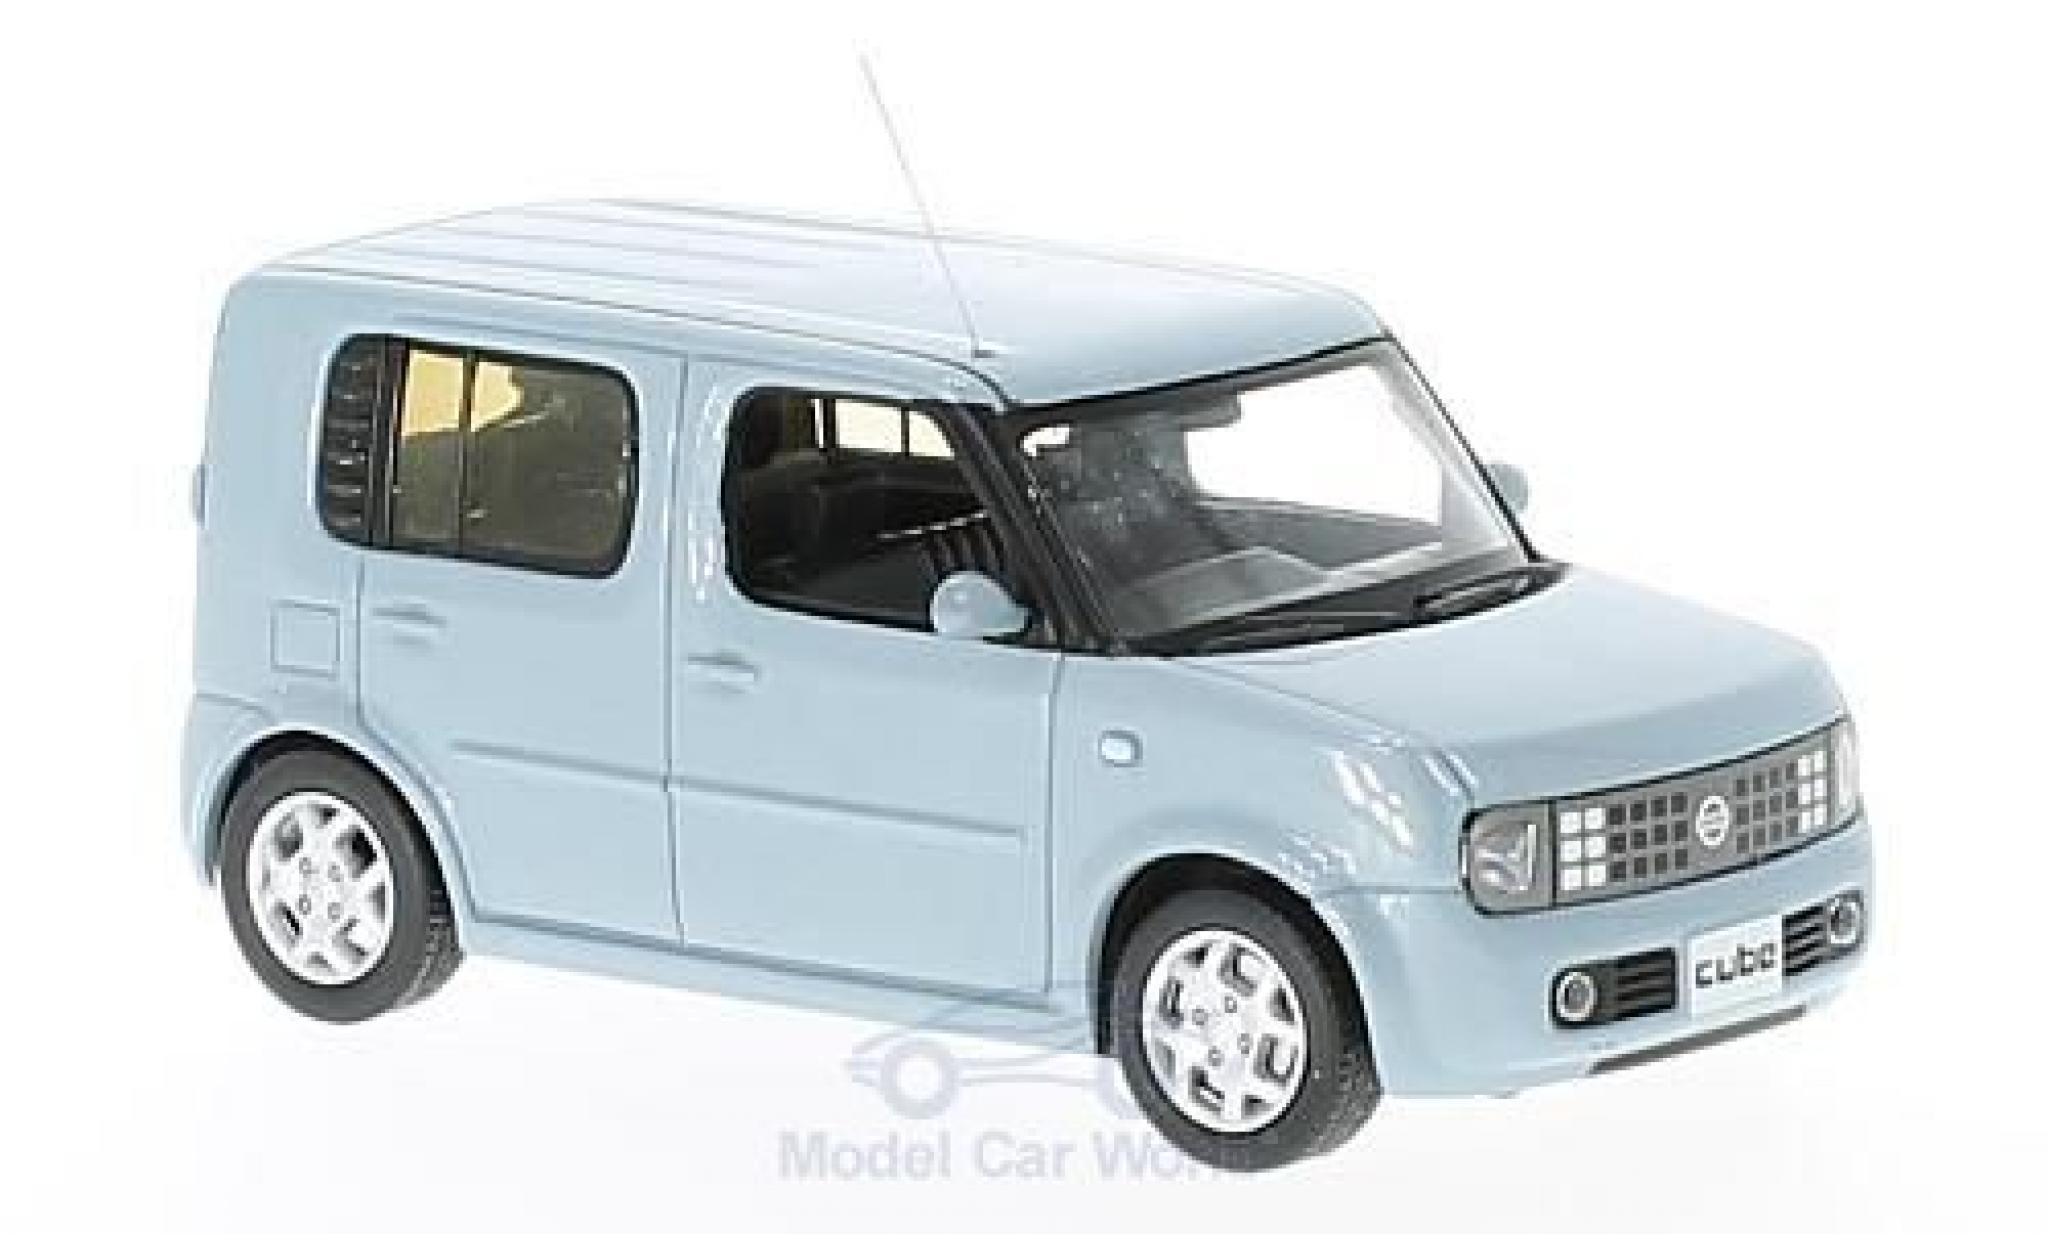 Nissan Cube 1/43 First 43 Models bleue RHD 2003